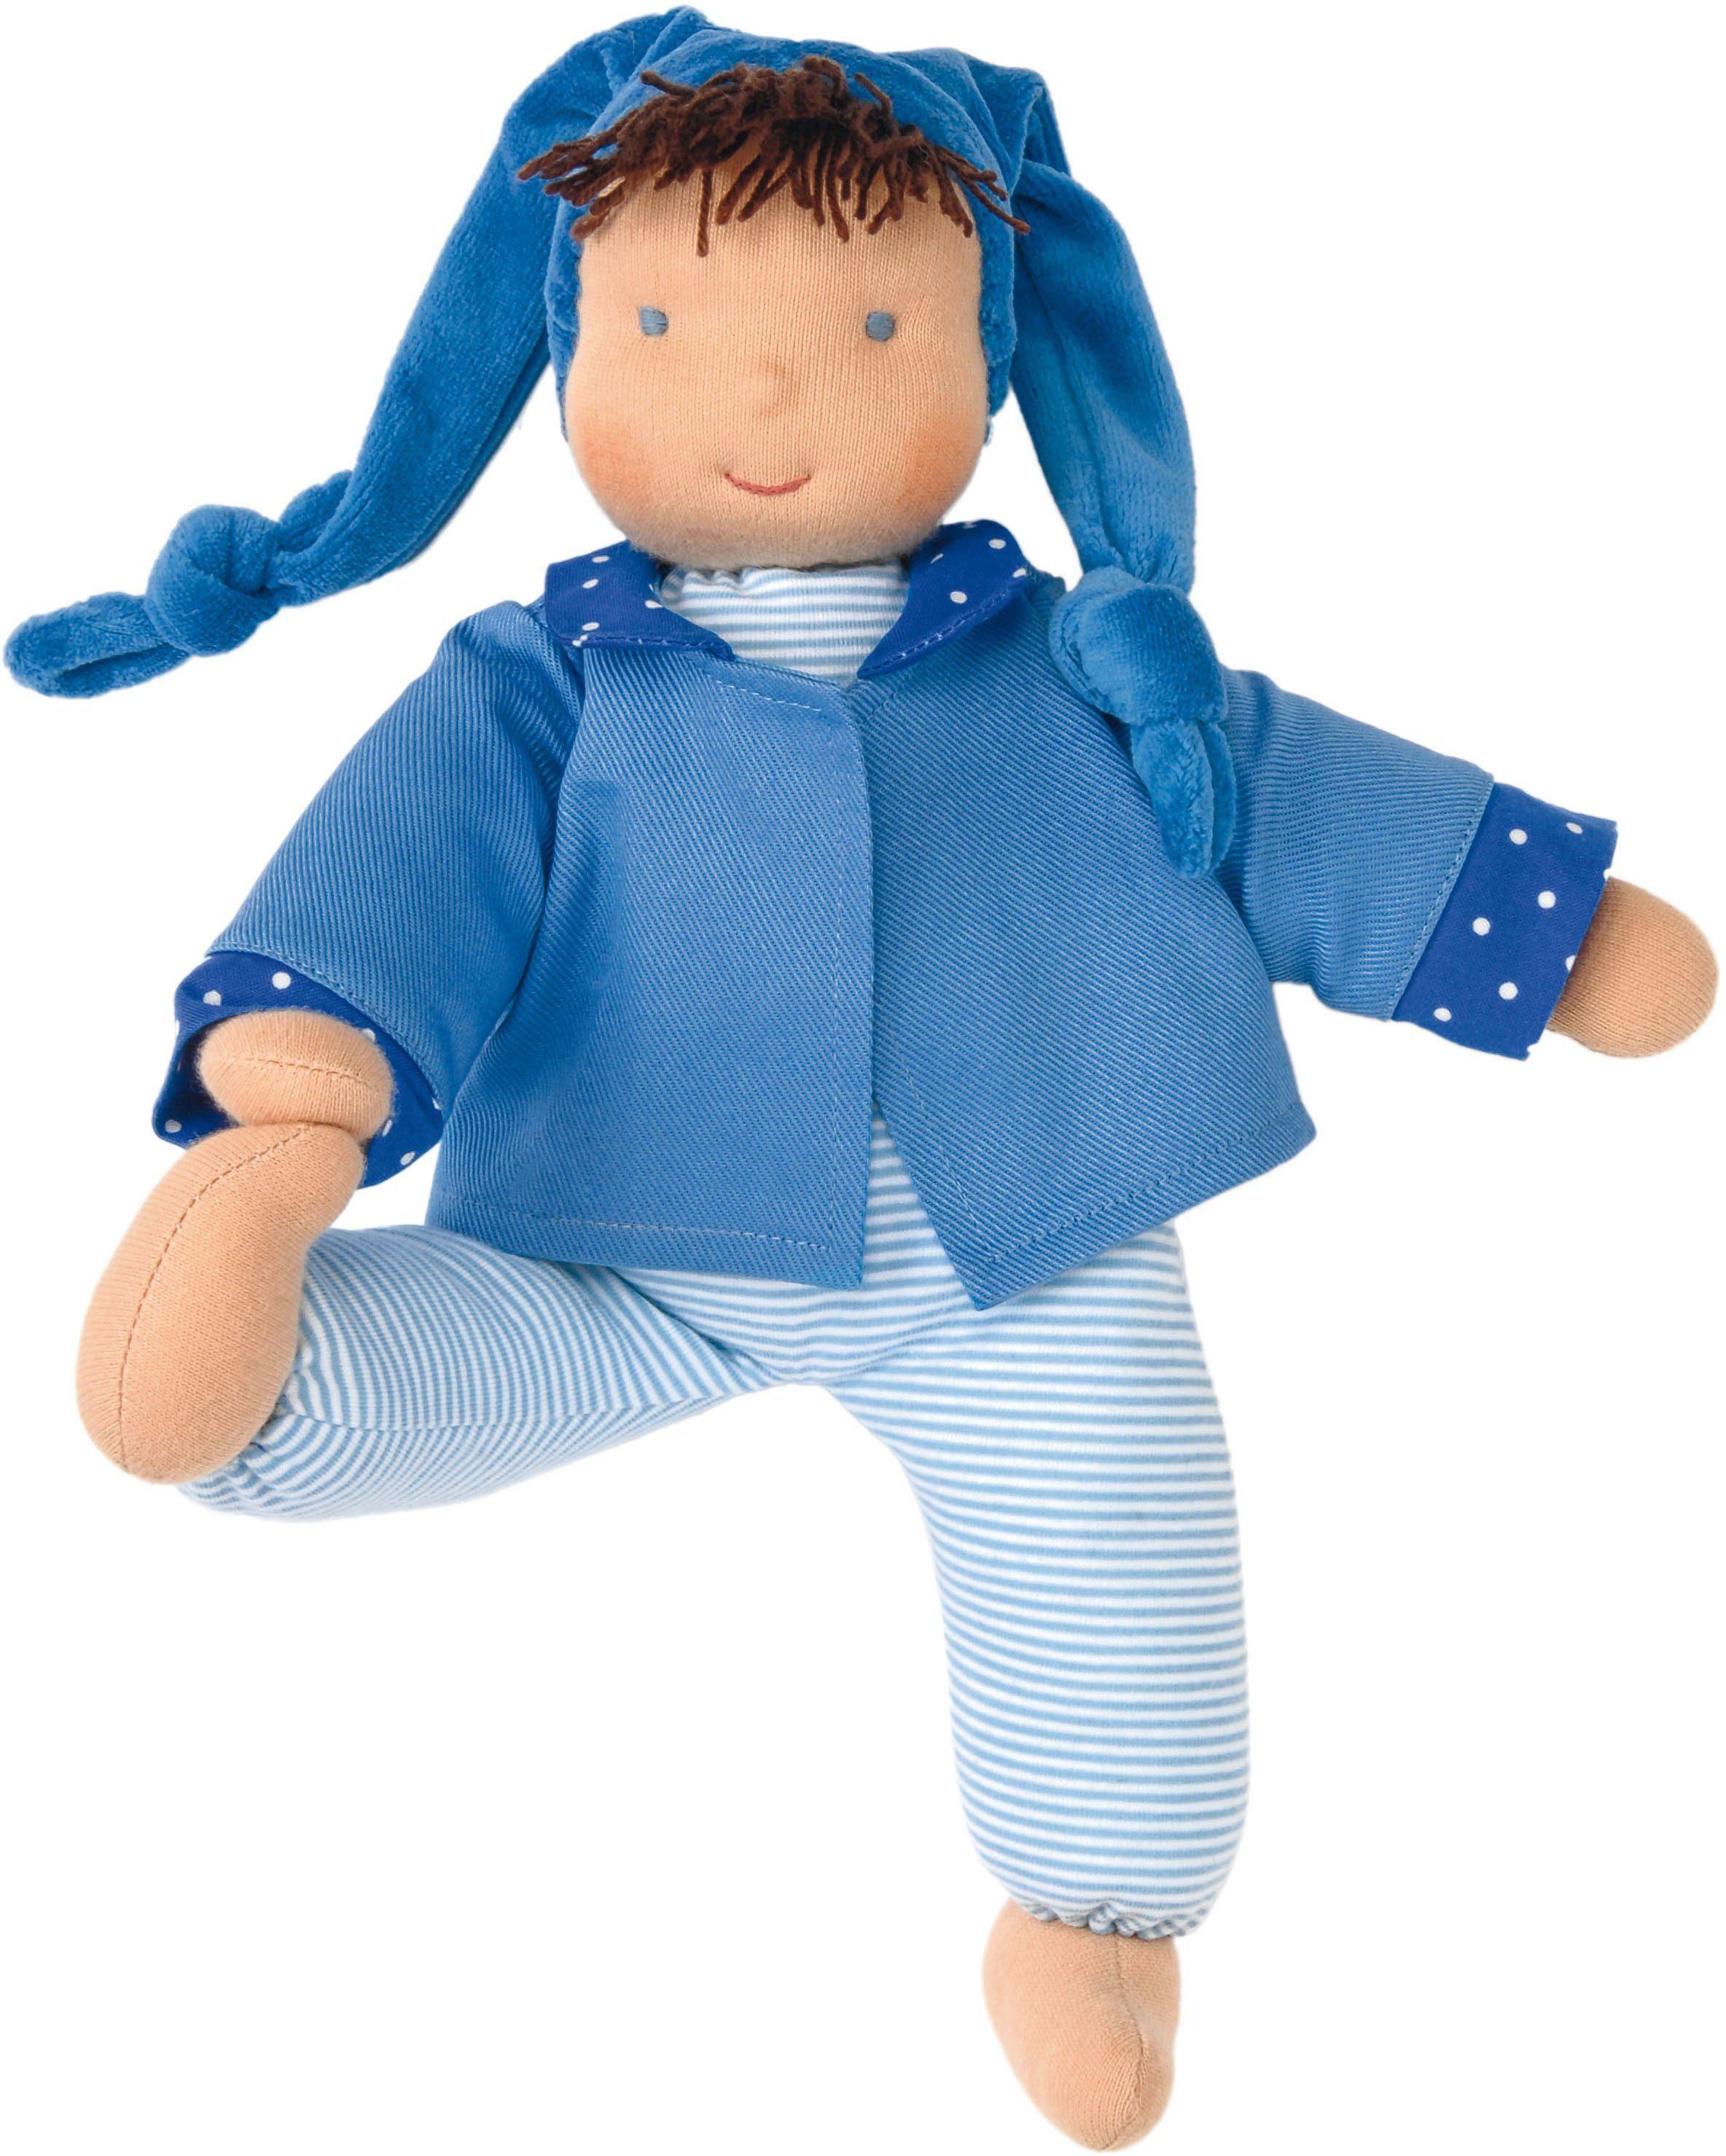 Käthe Kruse Stoffpuppe mit Zipfelmütze, »Schatzi Blau«